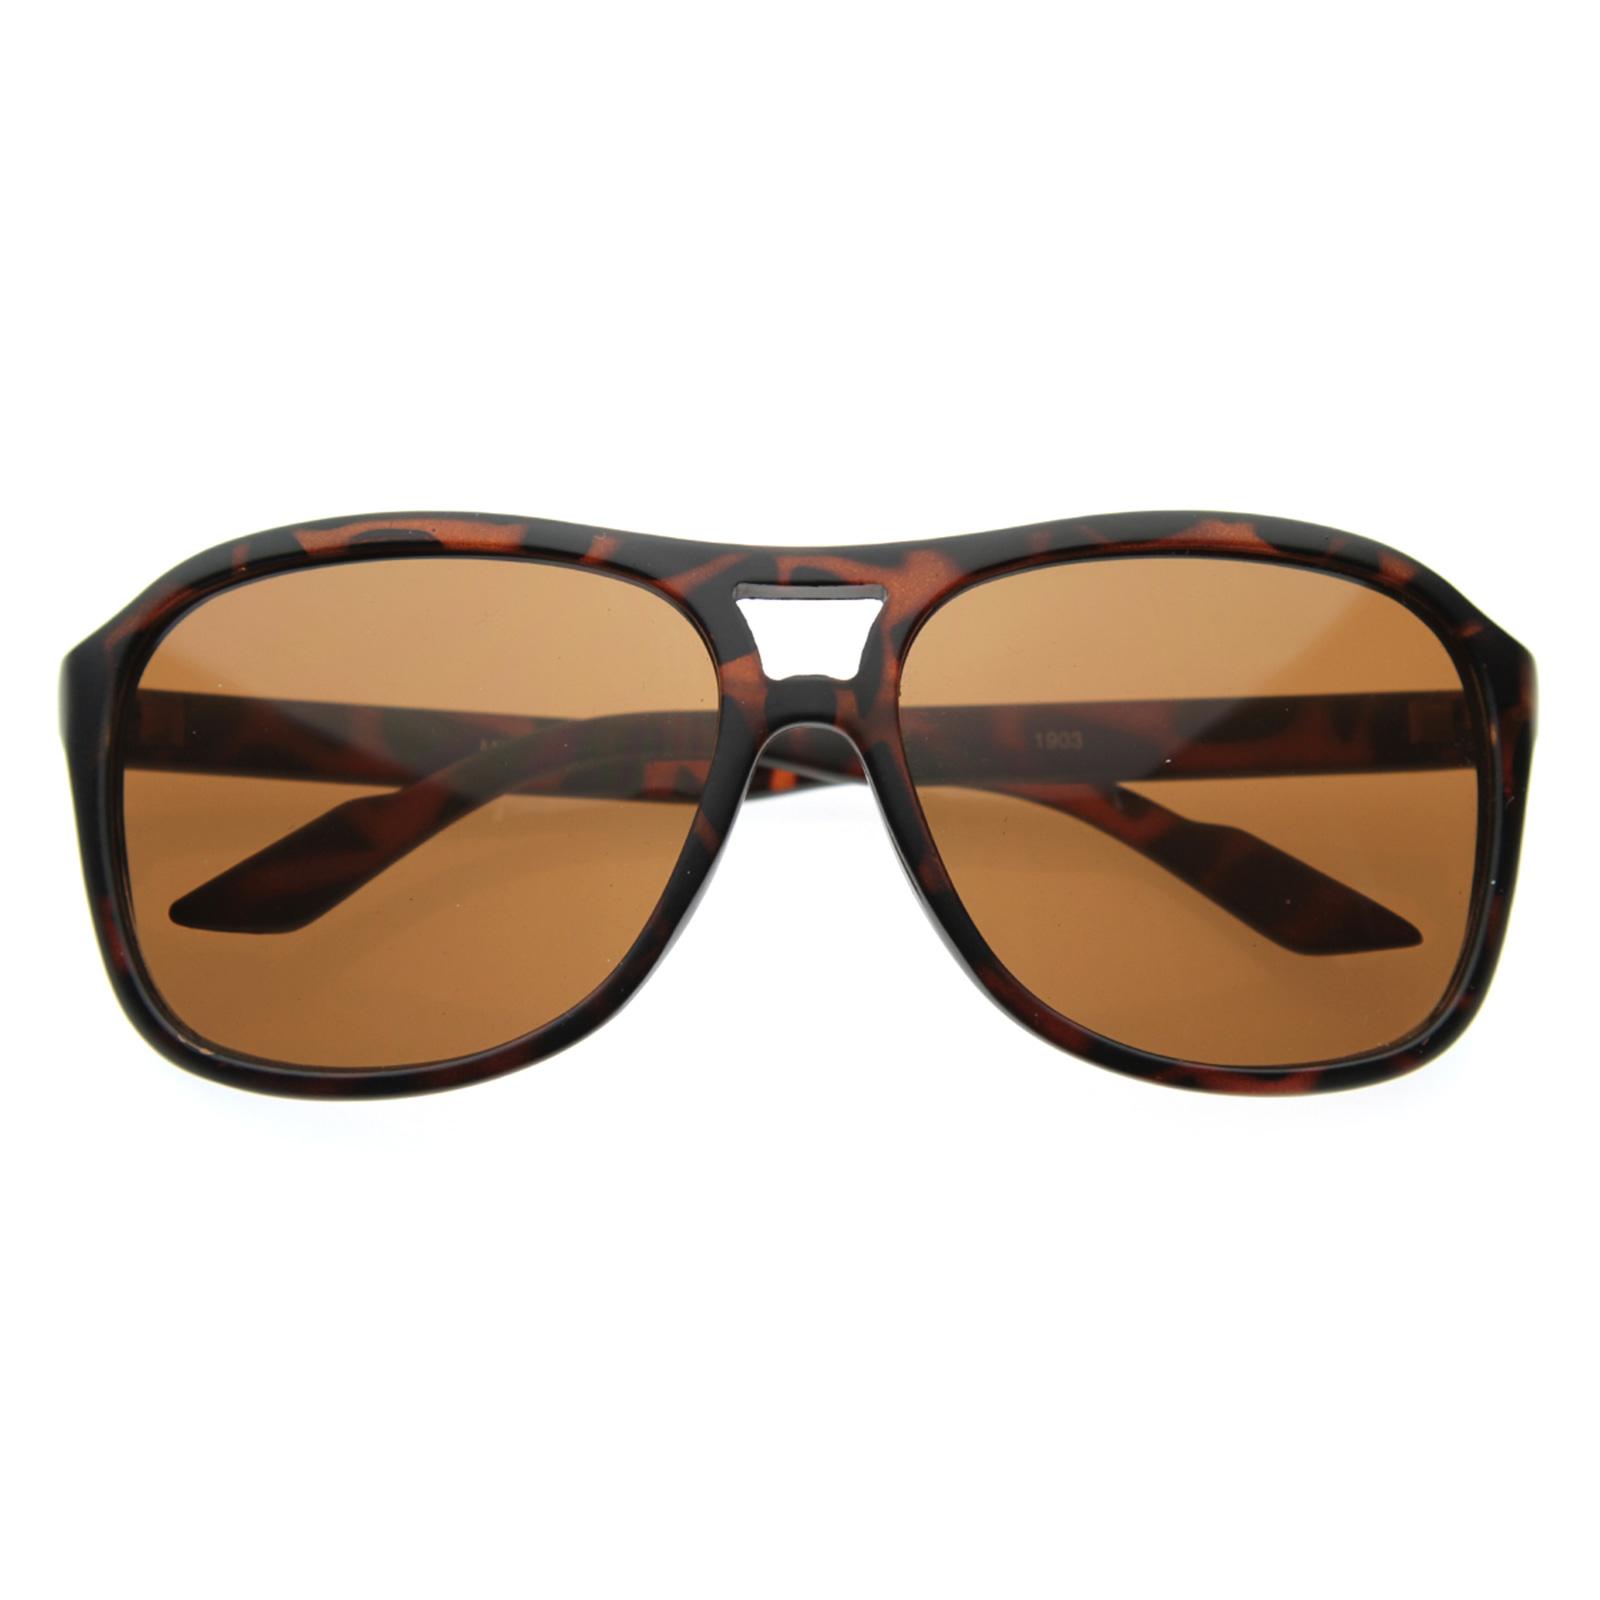 New-Modern-Active-Mens-Plastic-Lifestyle-Sports-Square-Aviator-Sunglasses-8221